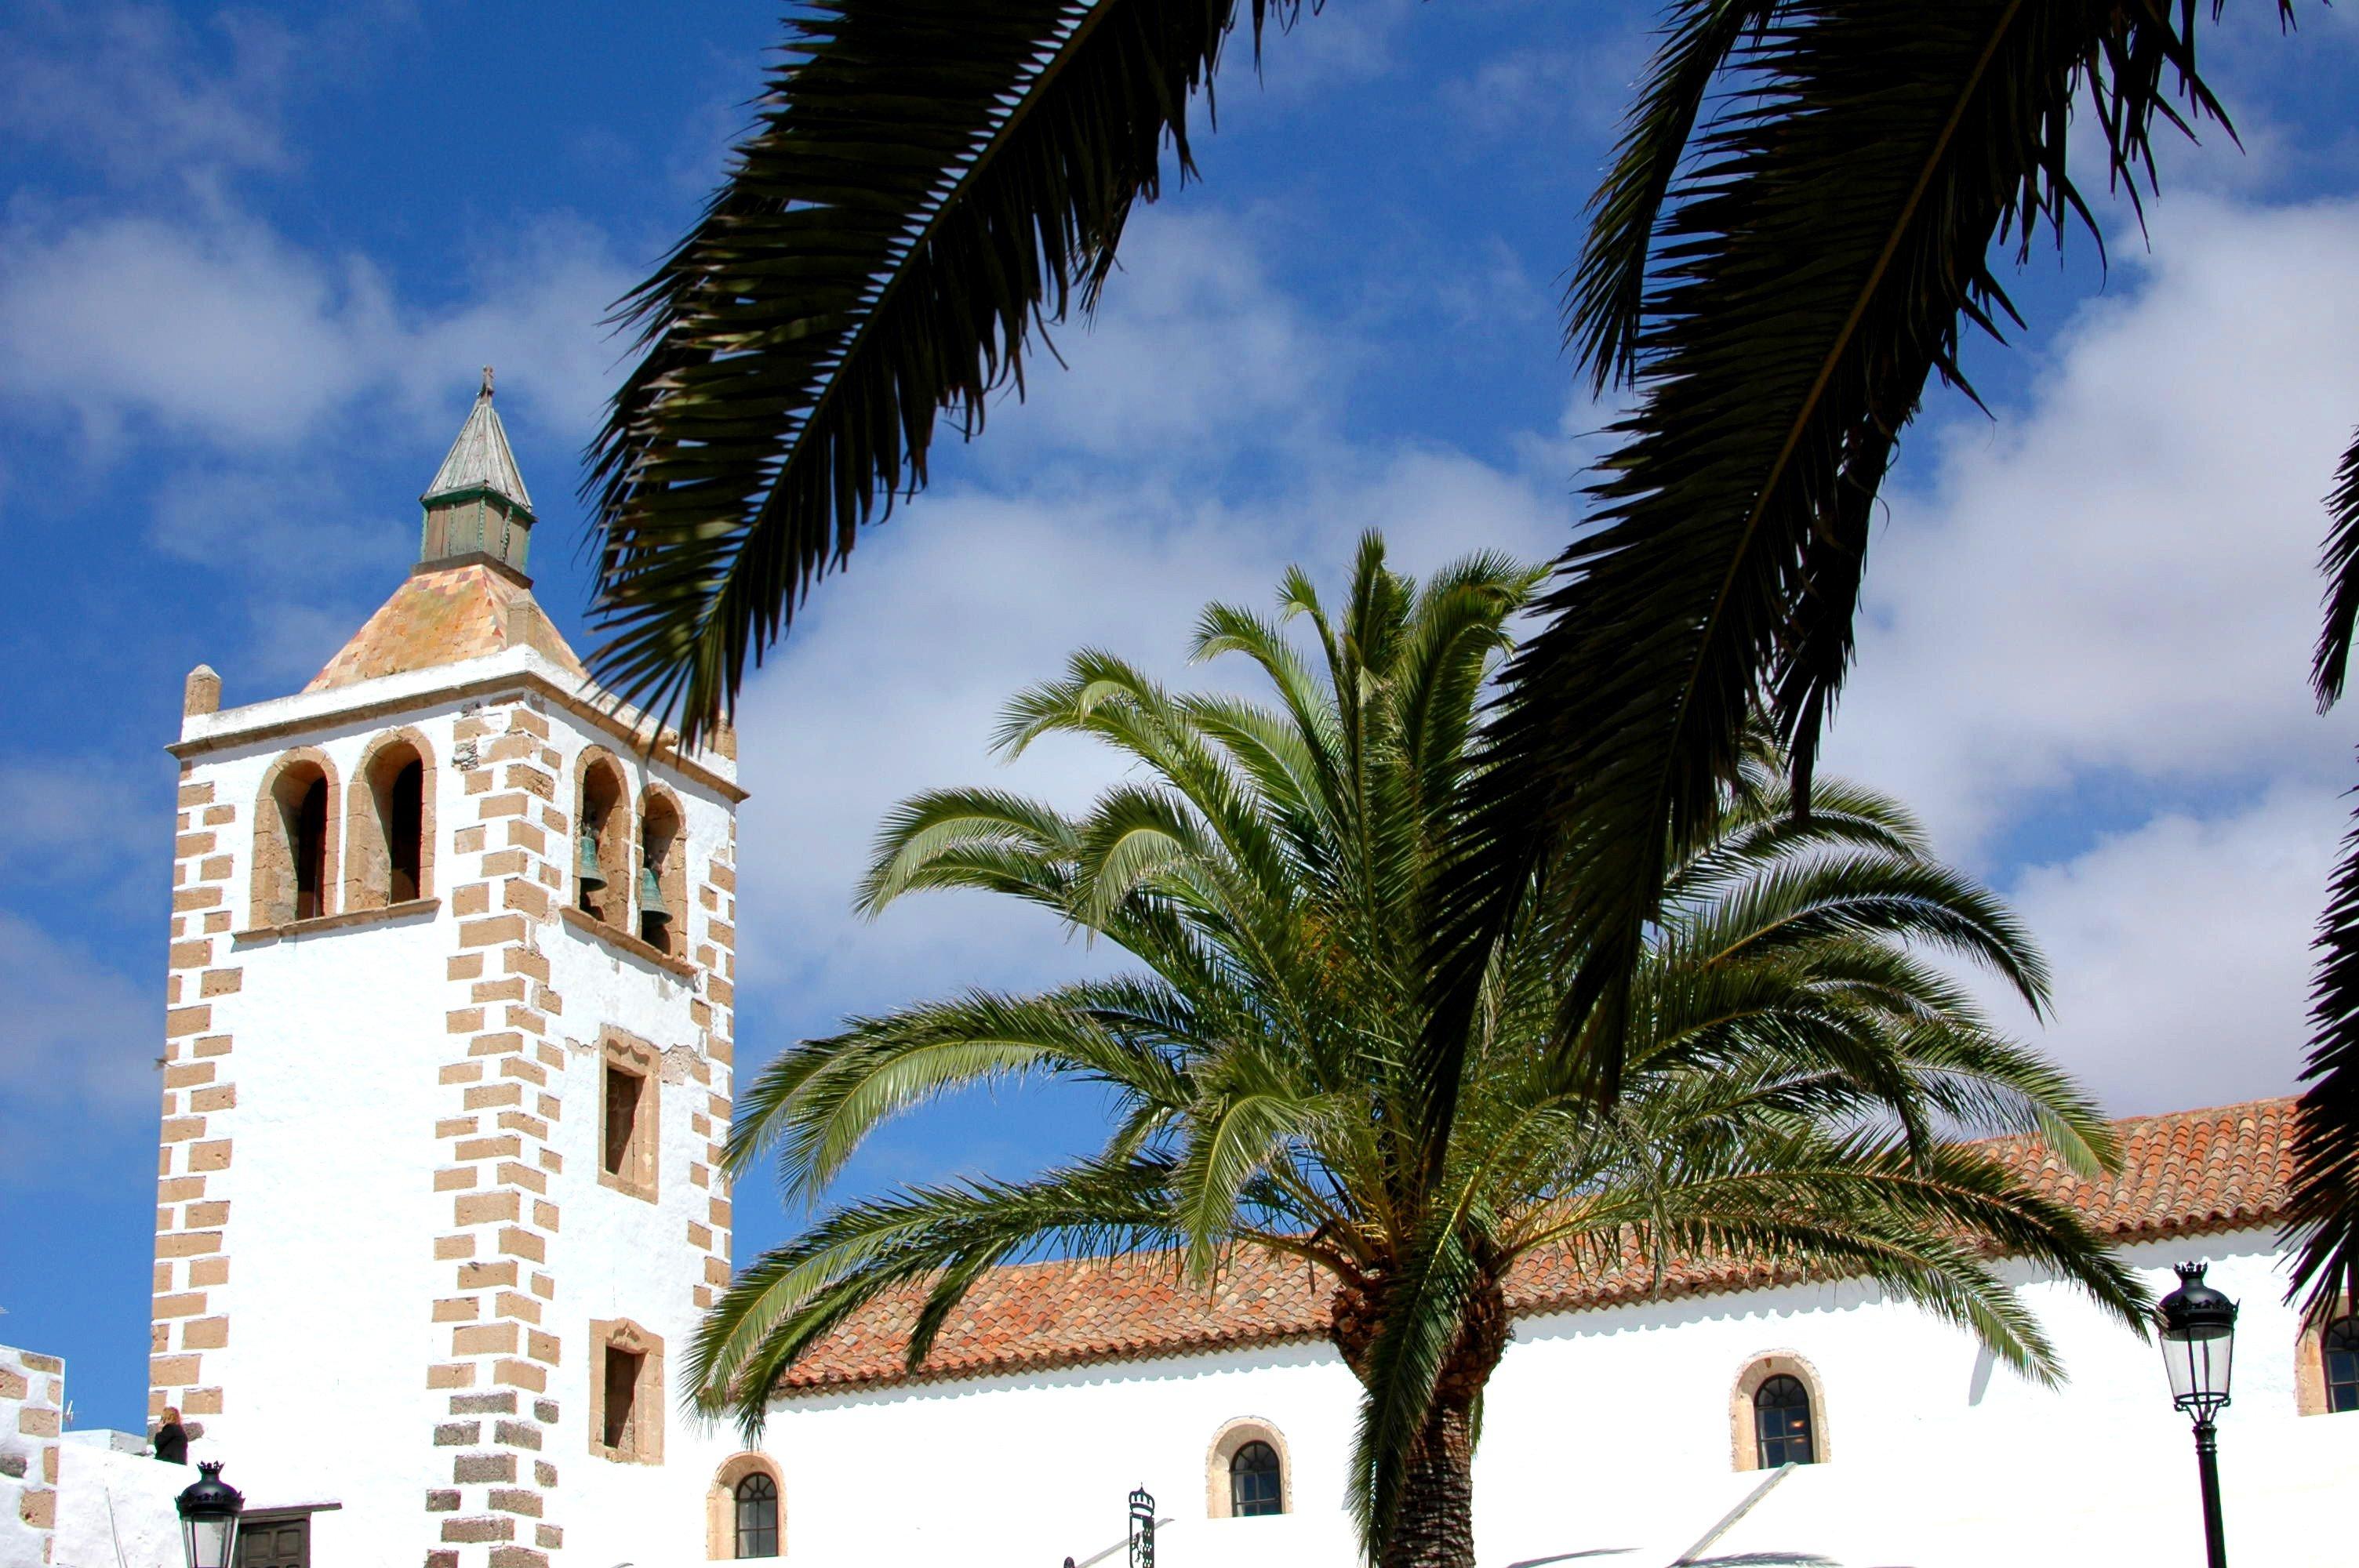 Betancuria, Fuerteventura Travel Guide and Photo Diary